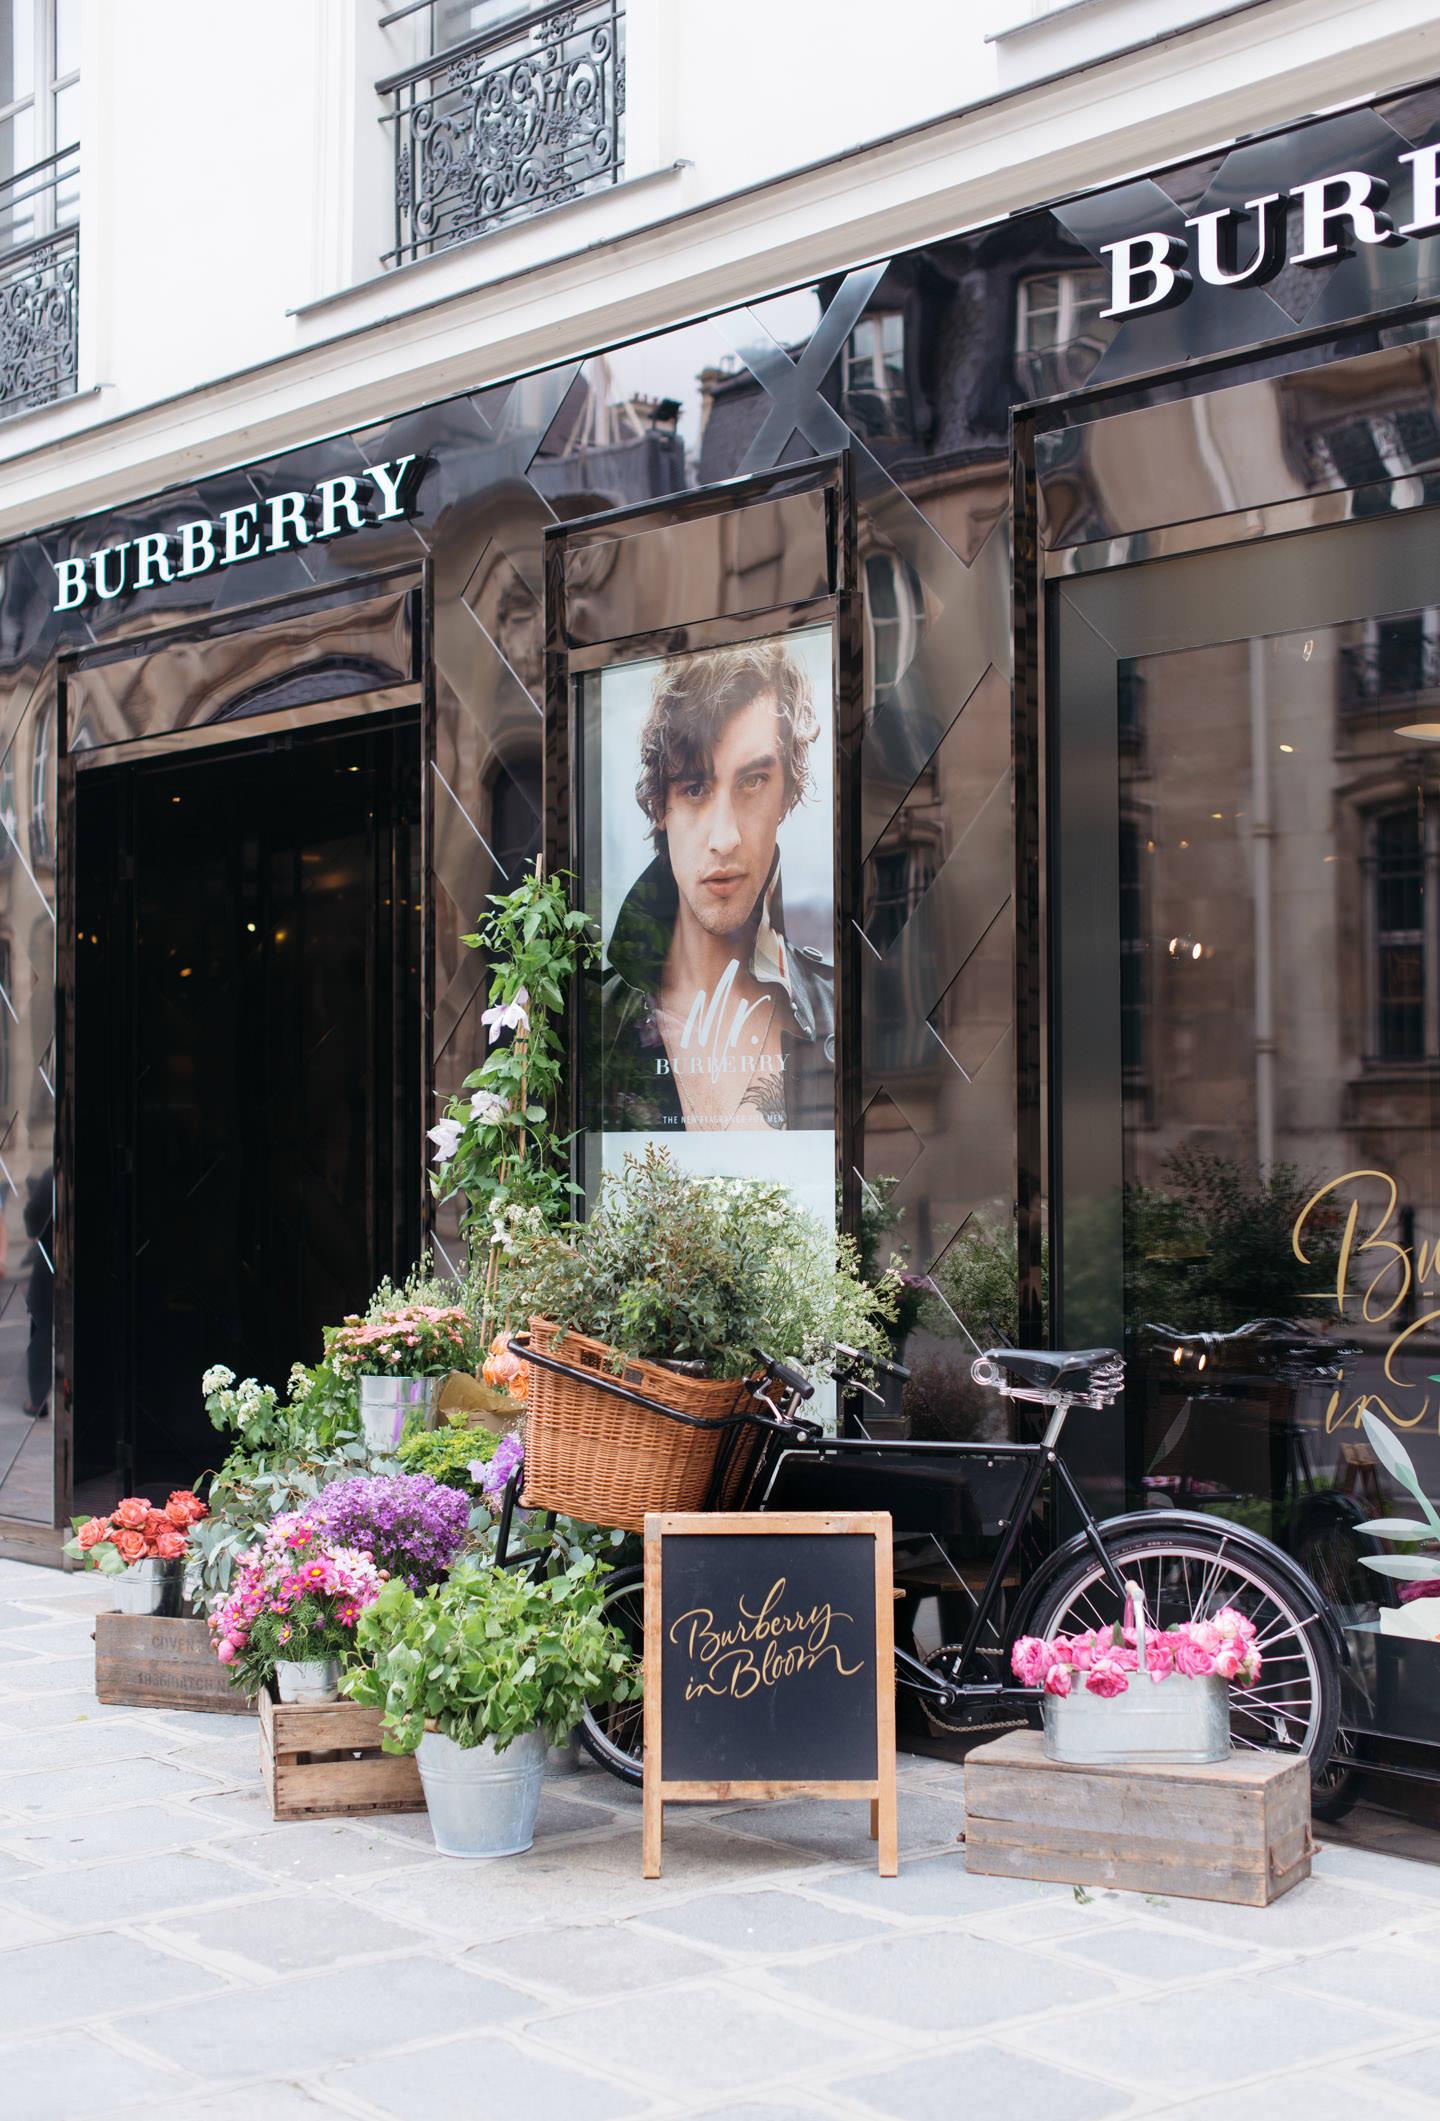 Blog-mode-and-the-city-lifestyle-5-petites-choses-177-burebbety-bloom-paris